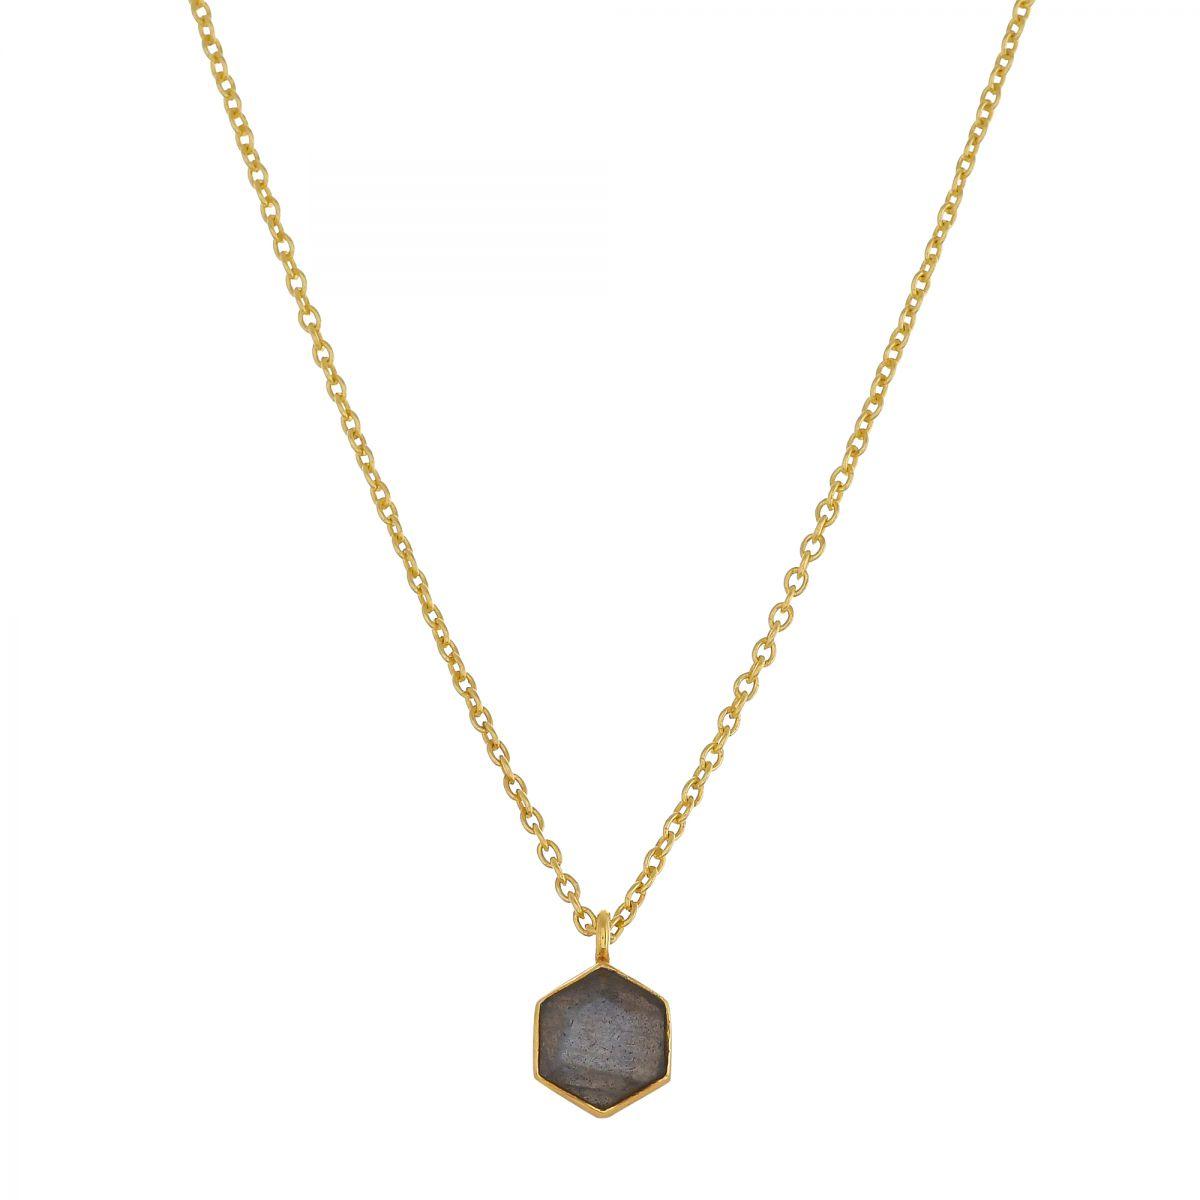 hcollier 6mm labradorite hexagon gold plated